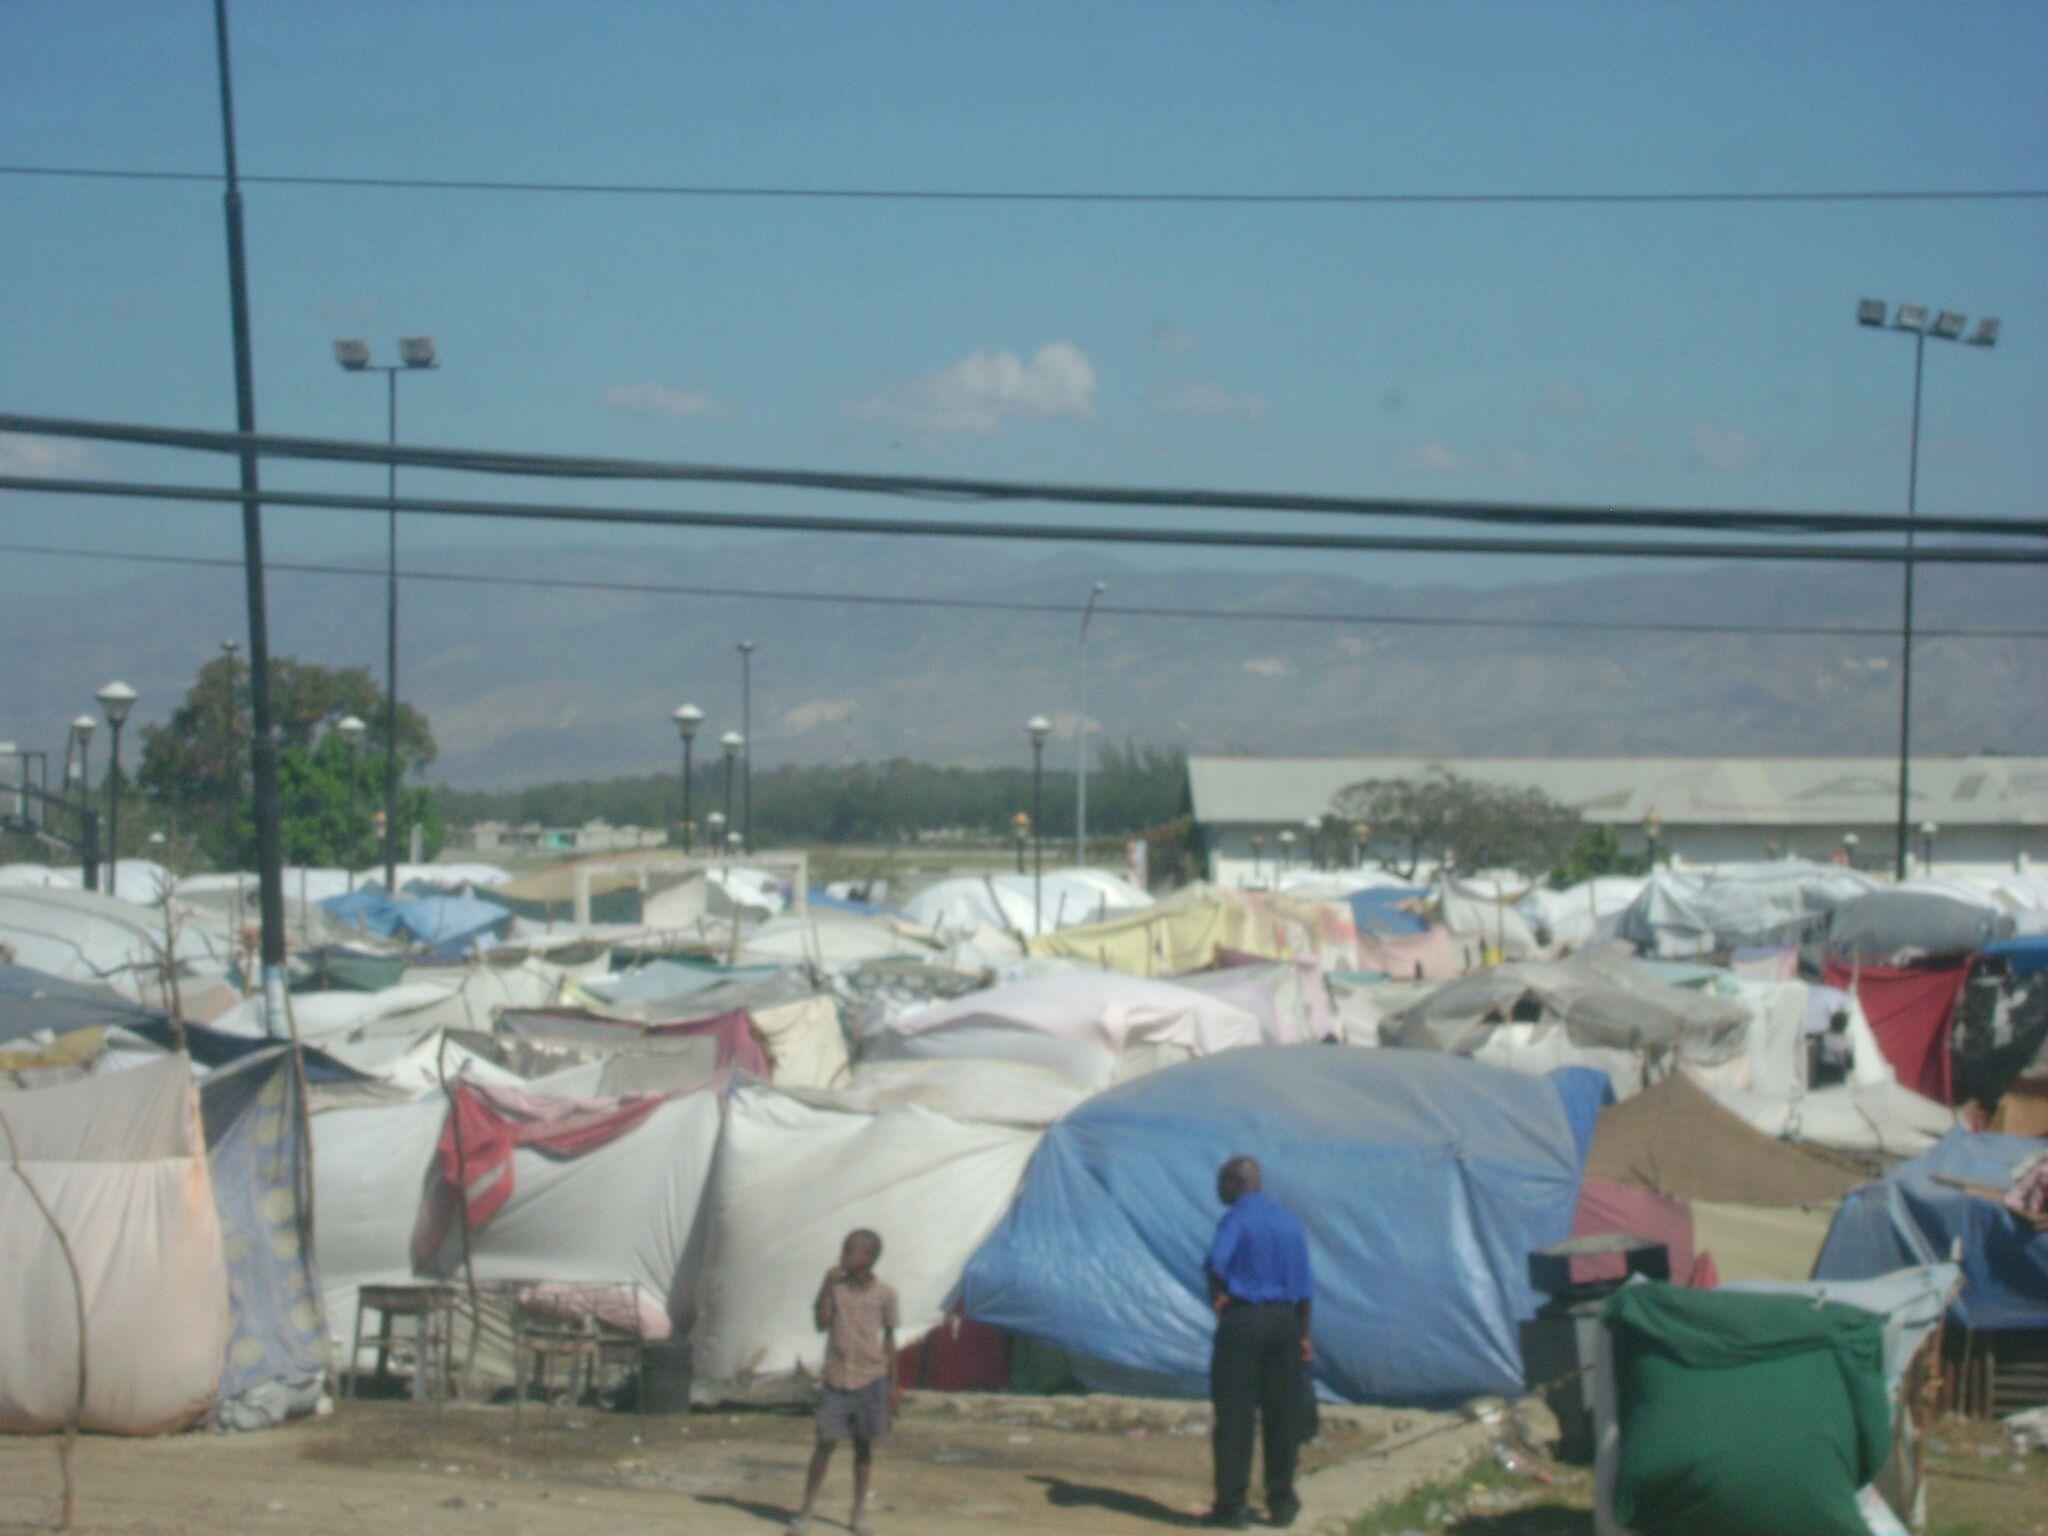 Tent city managed by international NGOs near Port au Prince, Haiti.